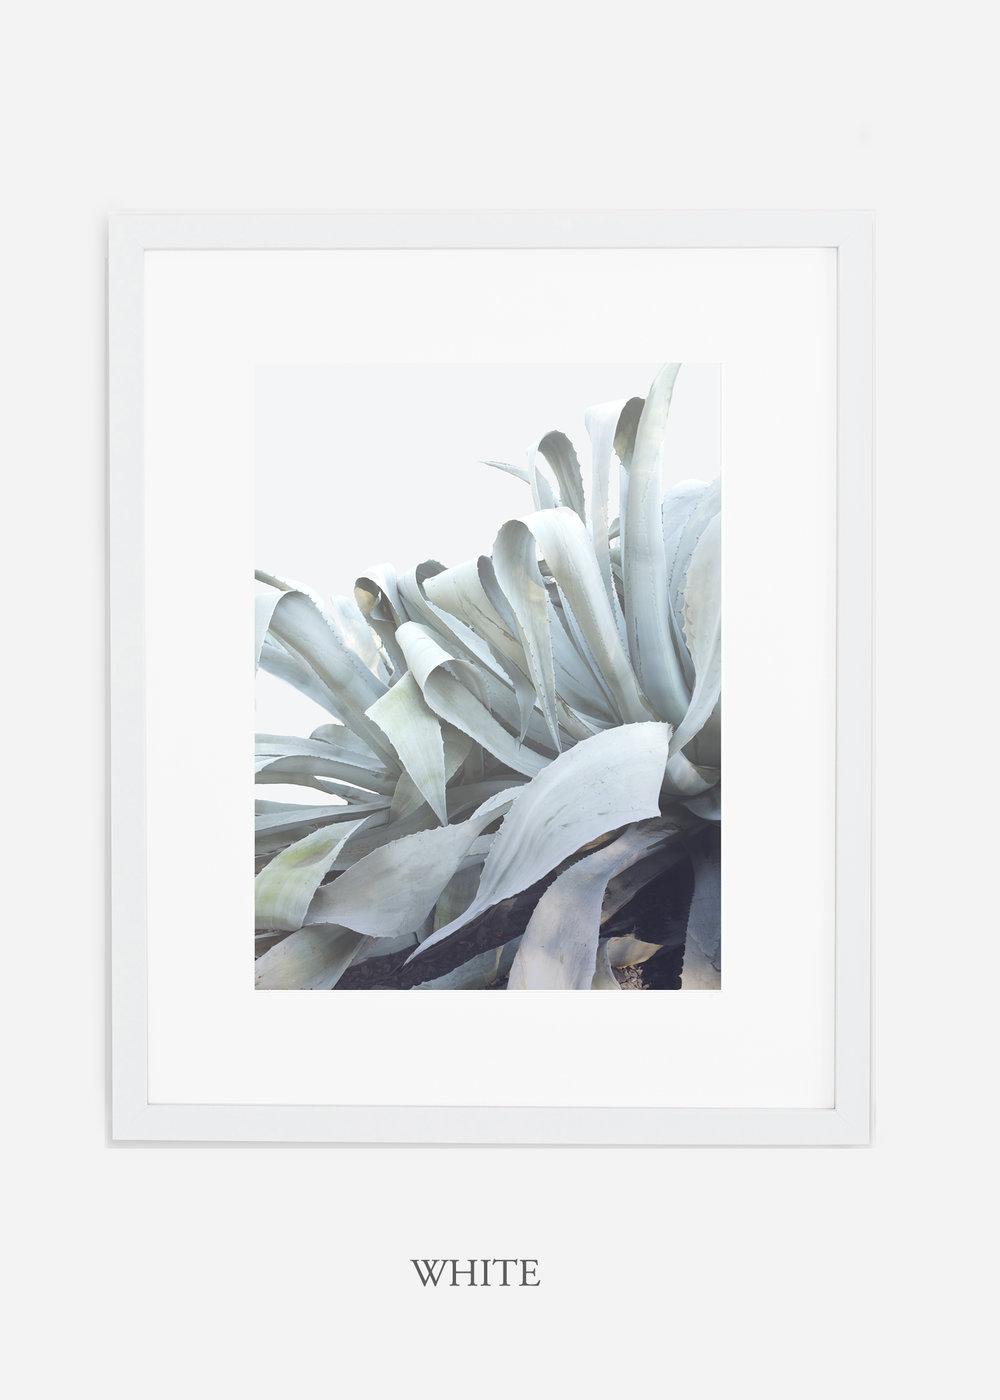 wildercalifornia_whiteframe_WinterWhite_AgaveNo.2_Desert_LosAngeles_Art_HomeDecor_interiordesign_design.jpg